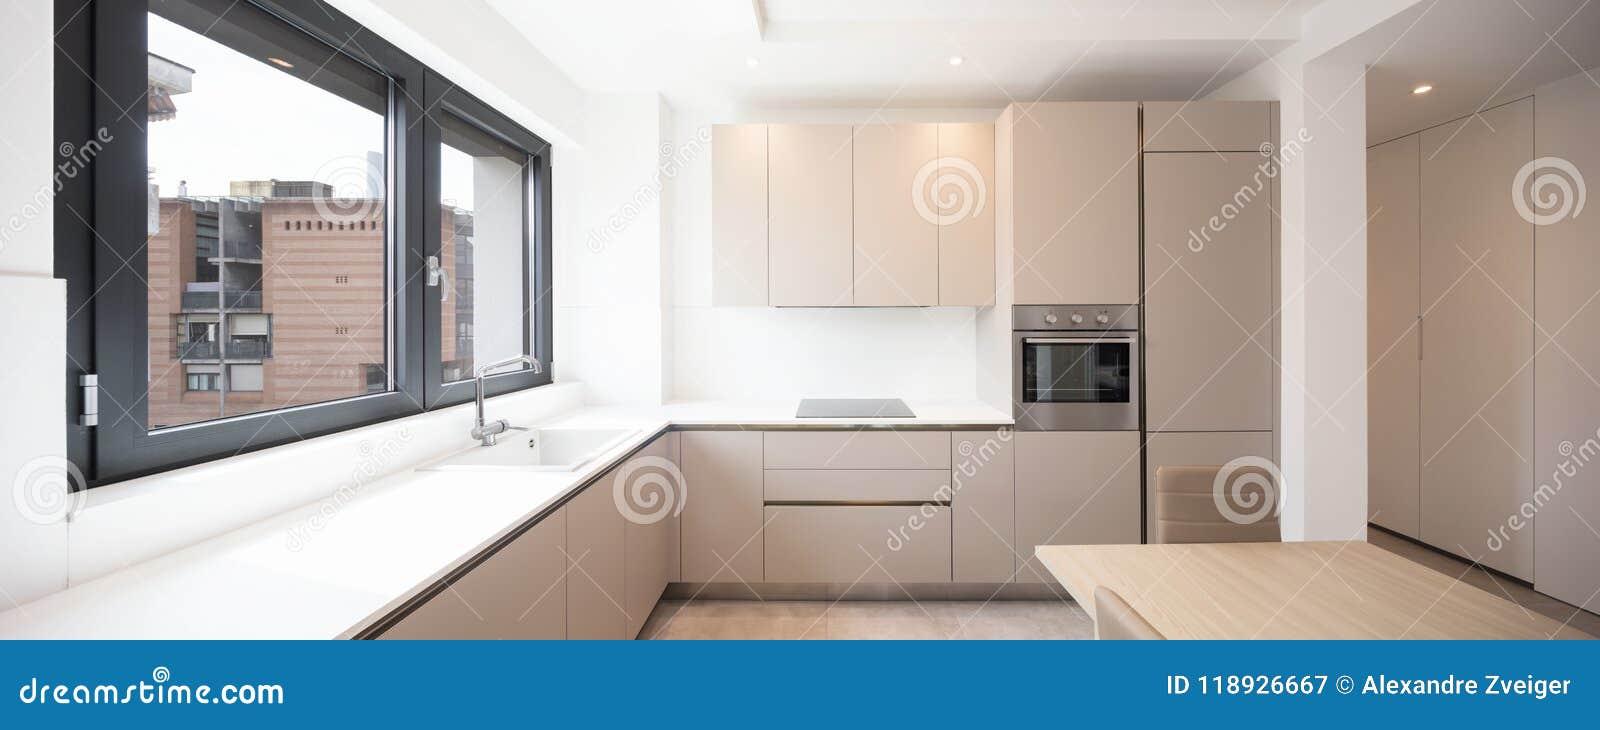 Cucina minima in un appartamento moderno